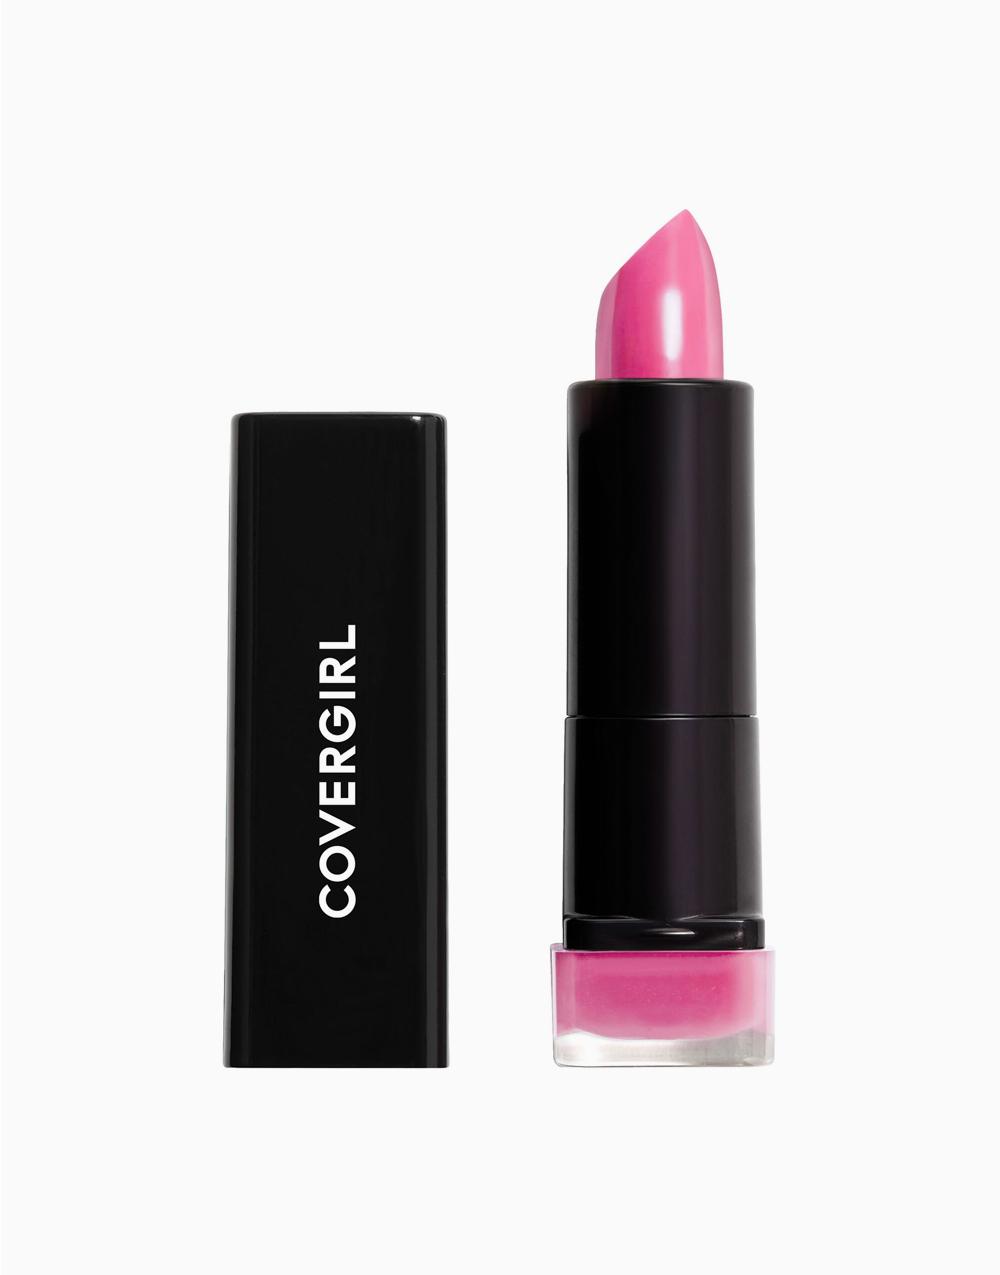 Exhibitionist Cream Lipstick by CoverGirl   Yummy Pink